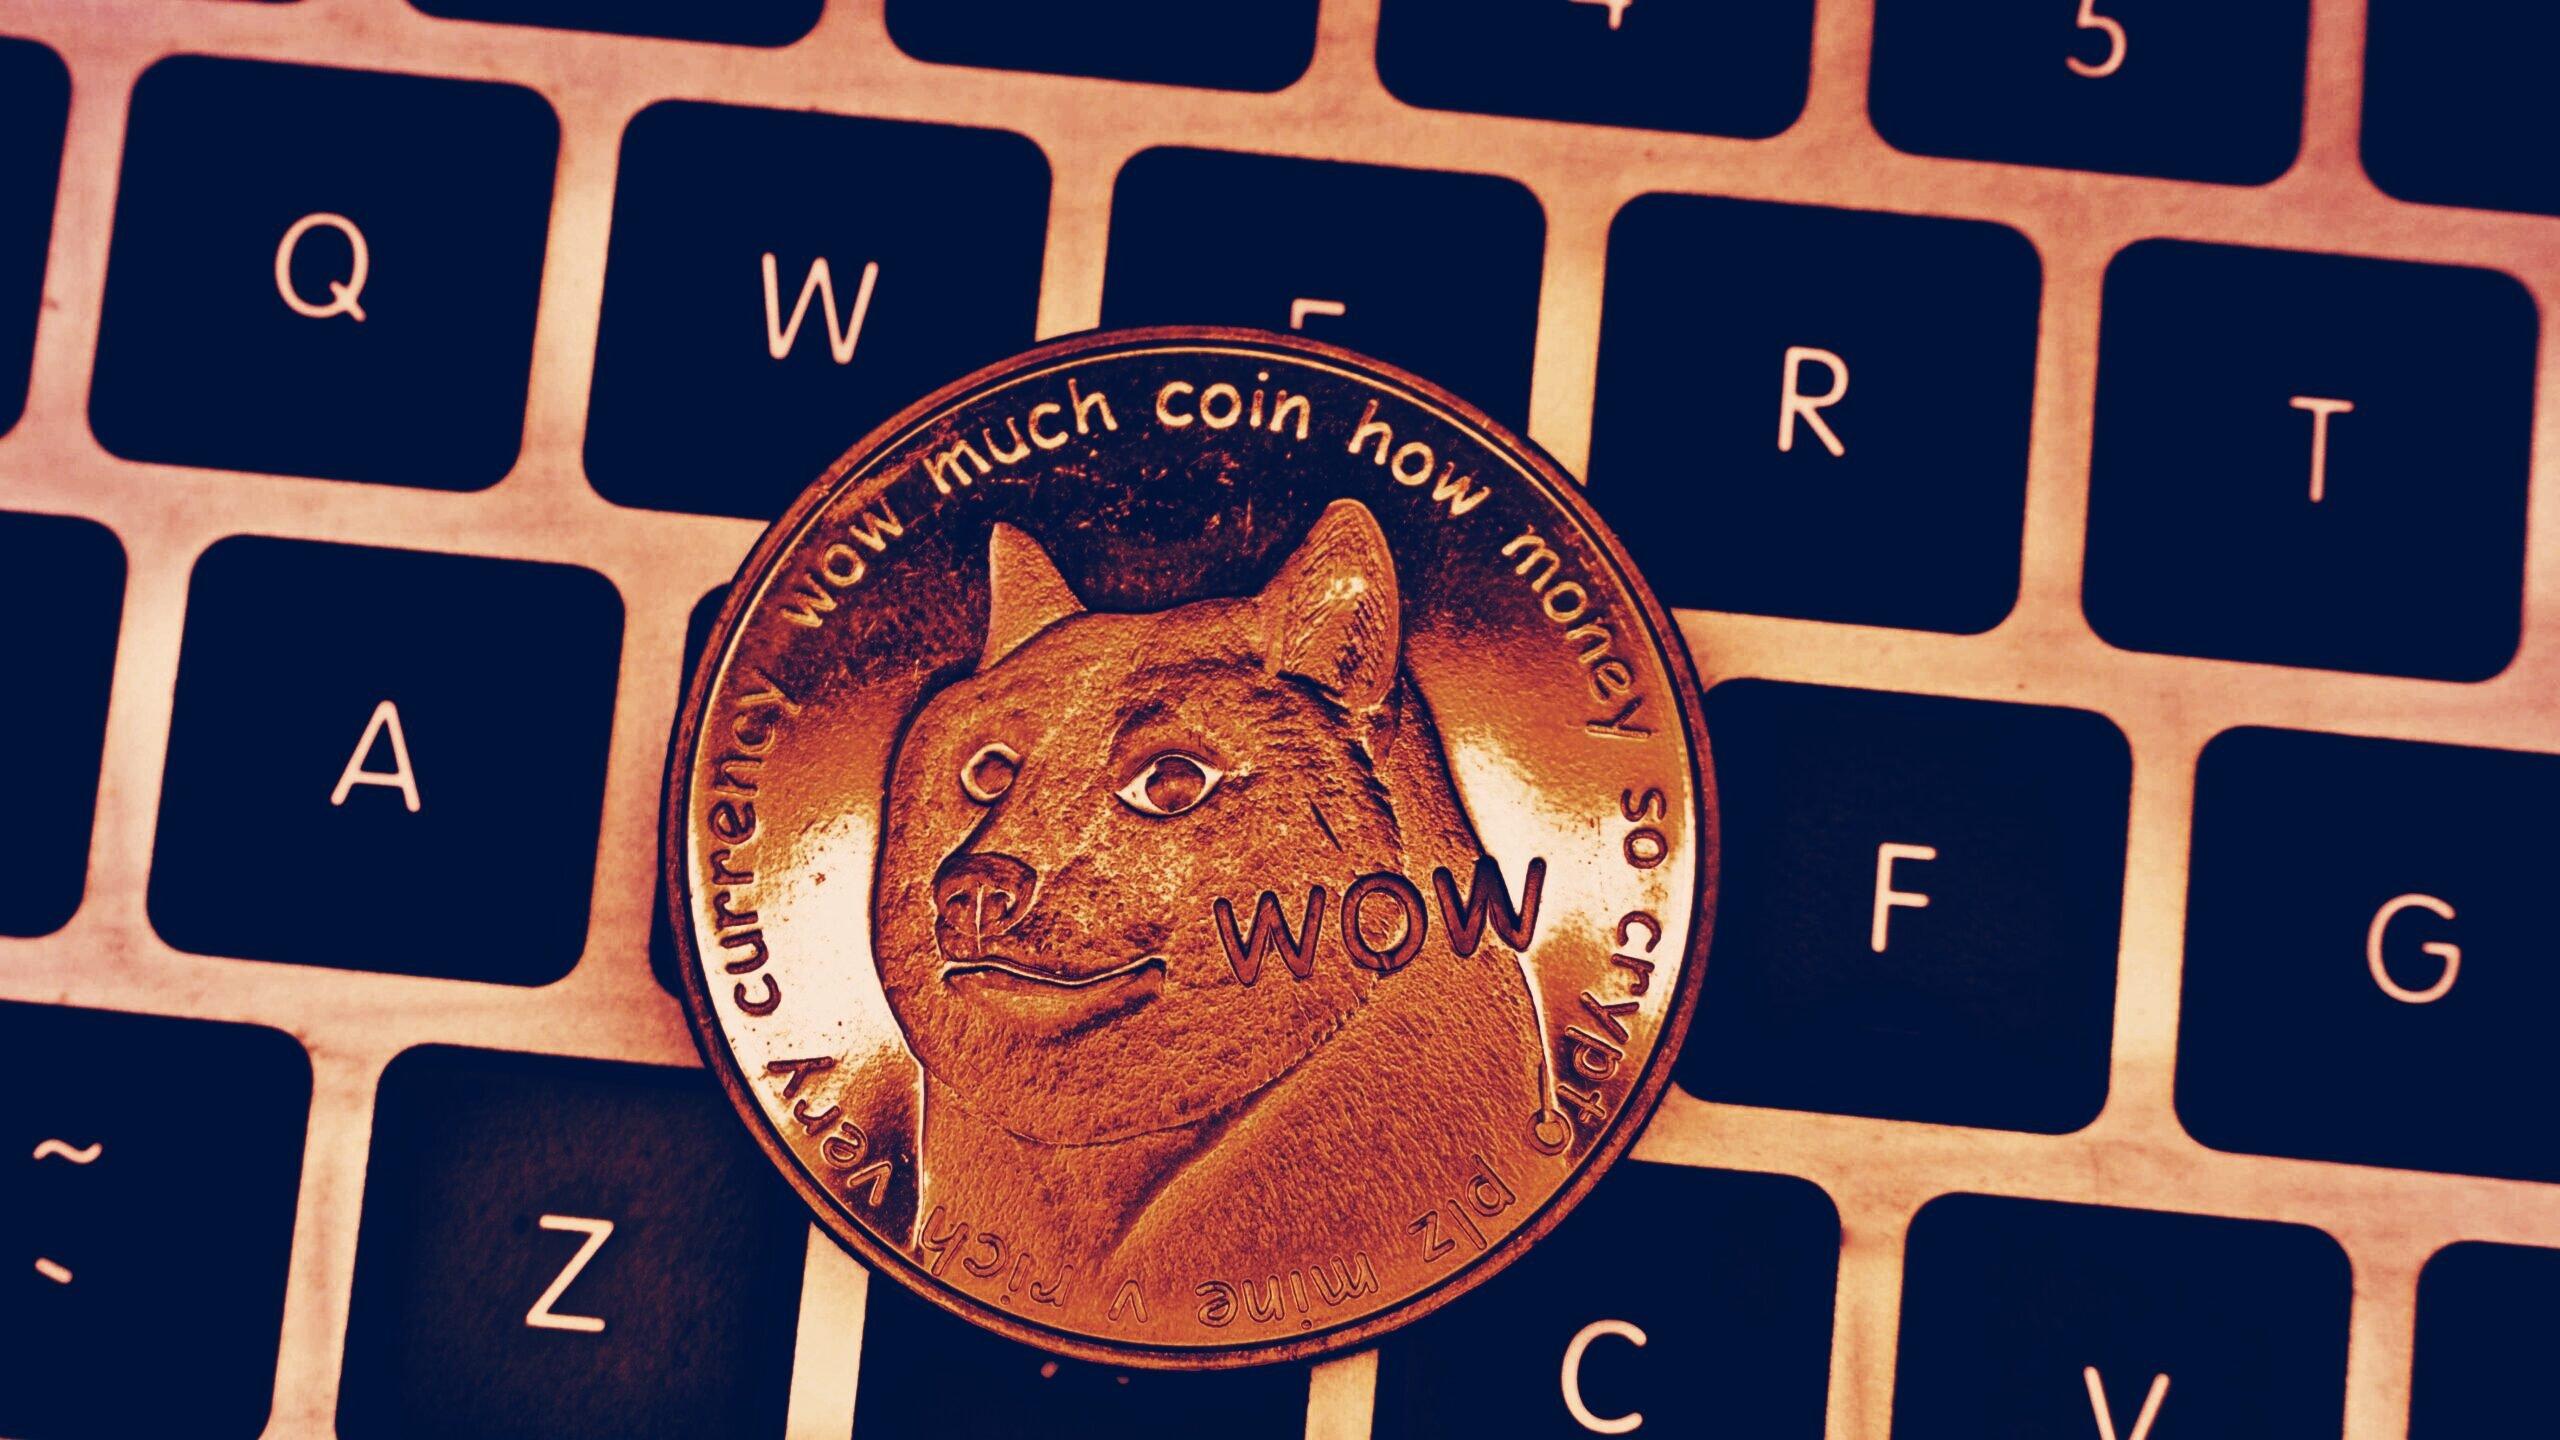 Dogecoin Price Down 20% Since Coinbase Listing, Bitcoin Holds Steady